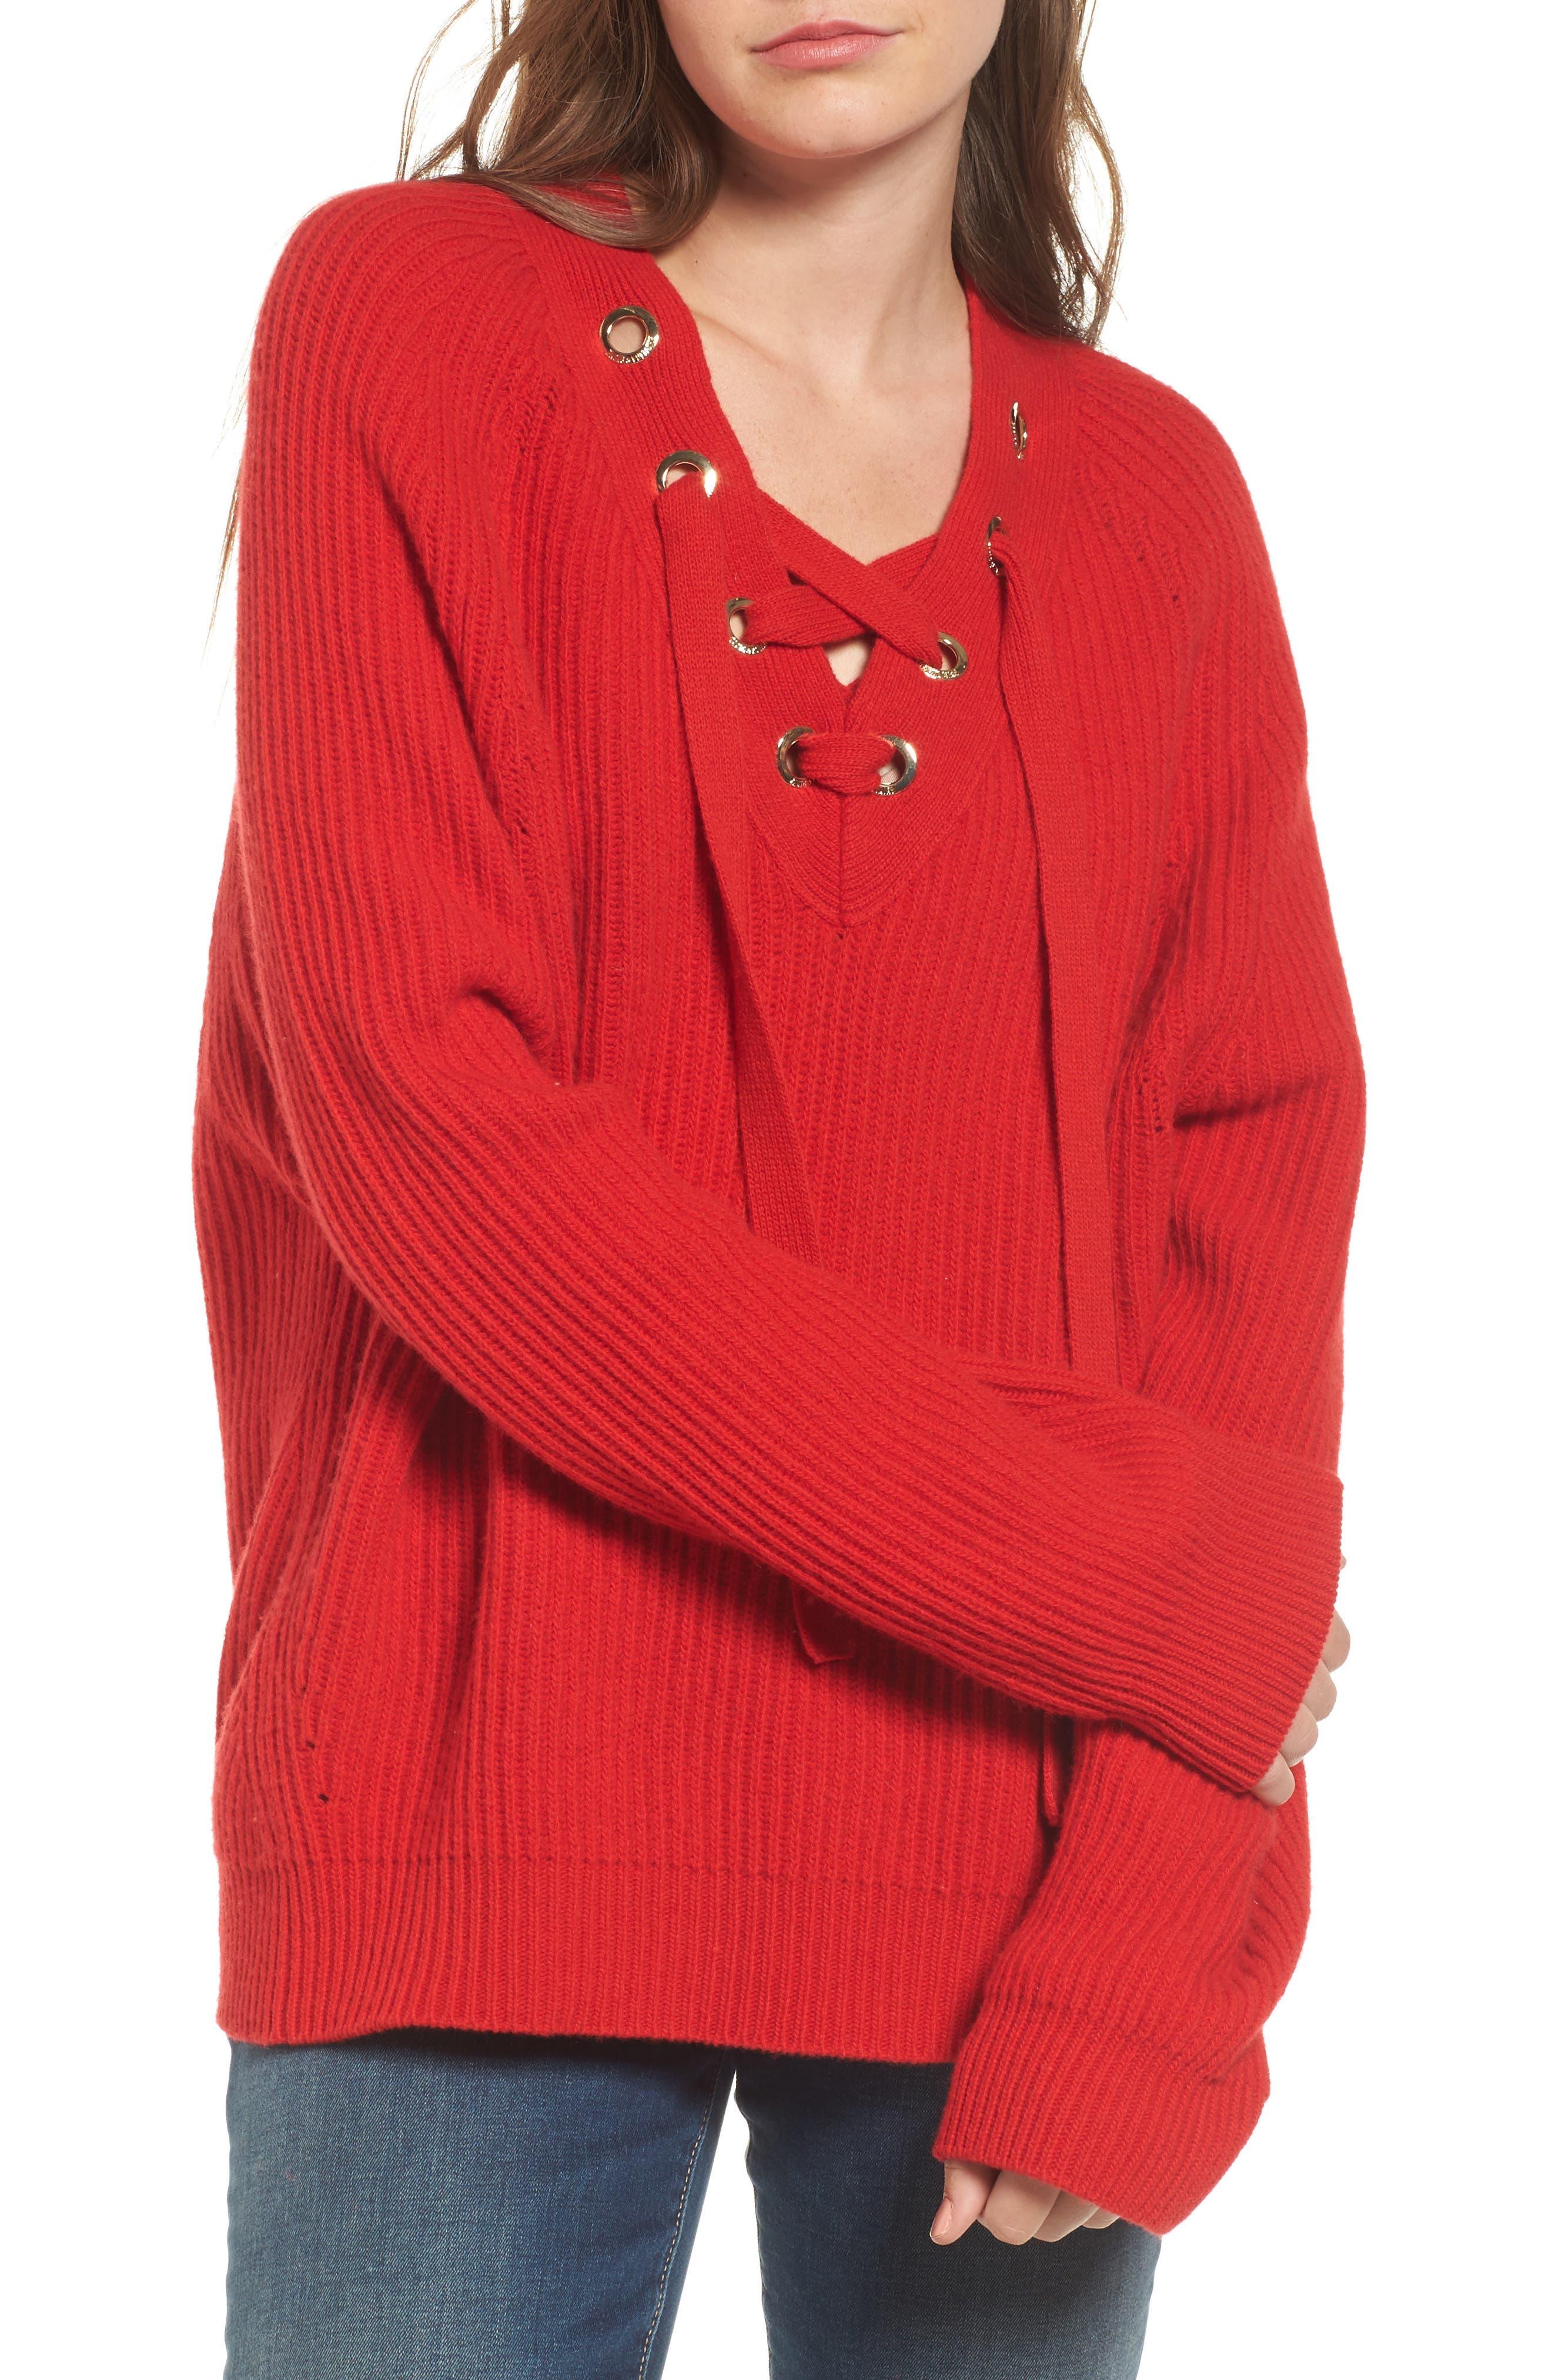 Zadig & Voltaire Kassy Wool Blend Sweater